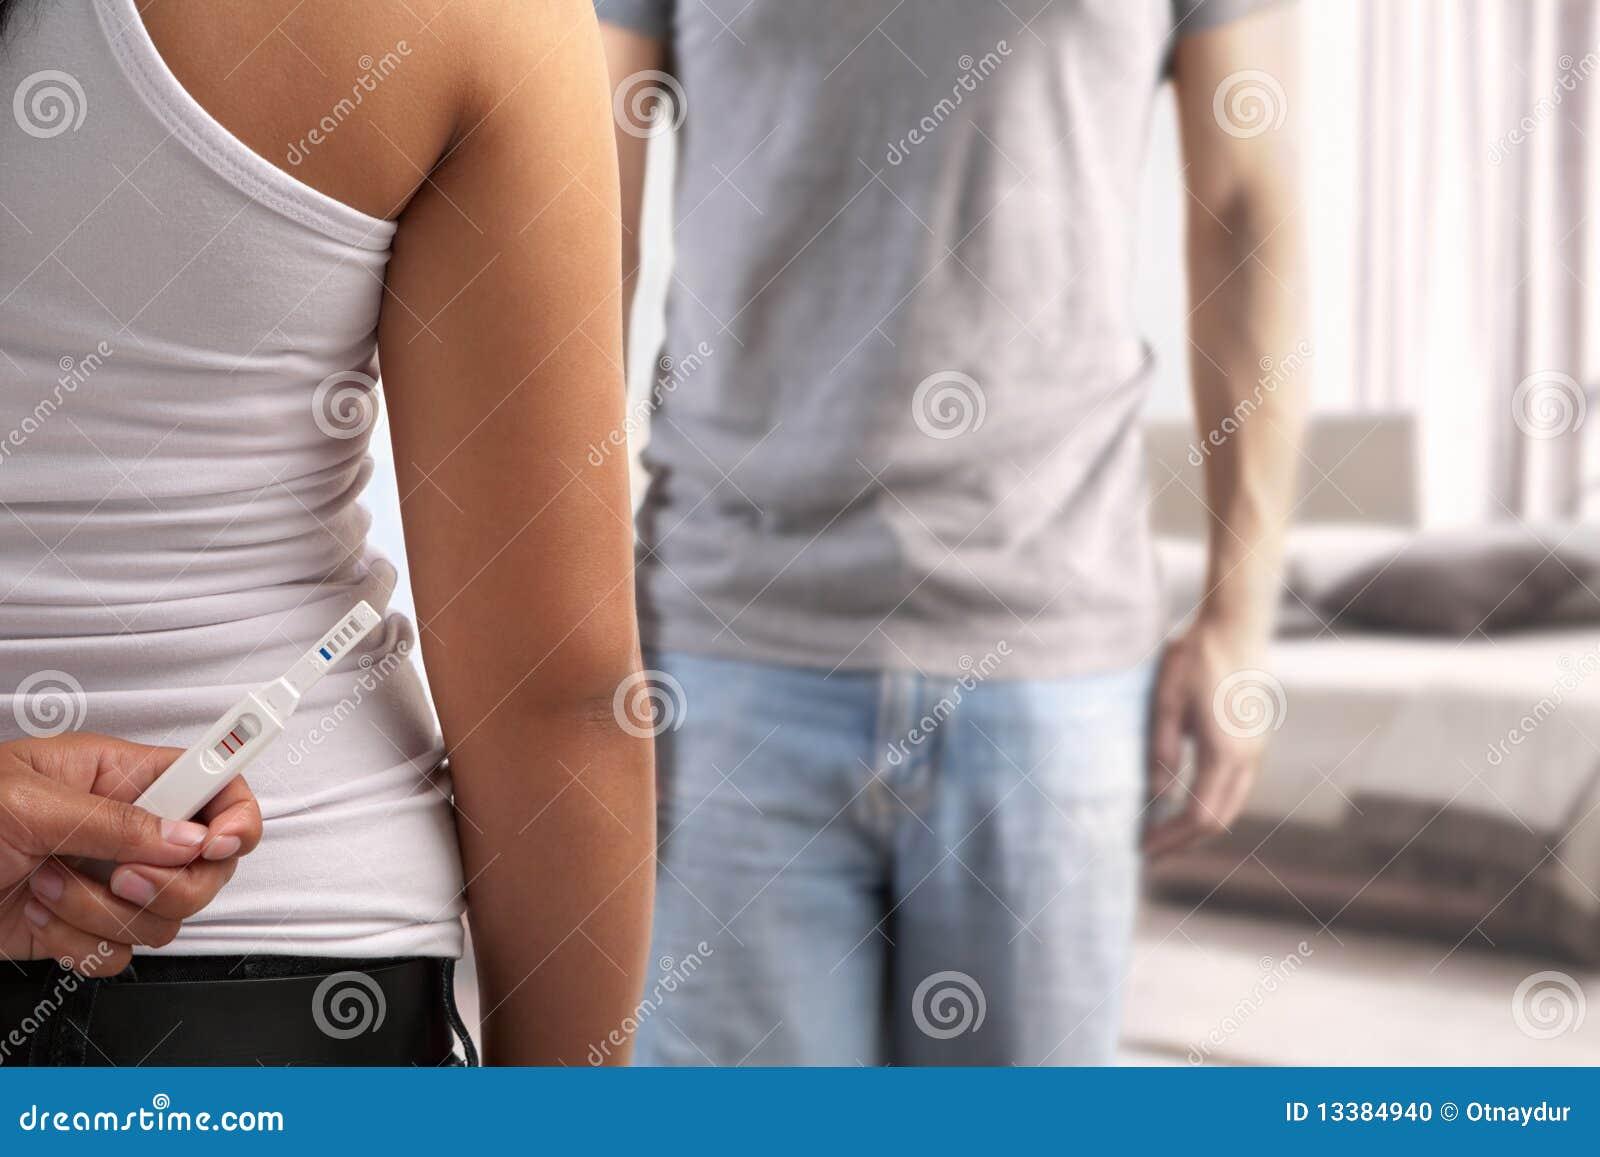 Essai de grossesse de dissimulation de conjoint